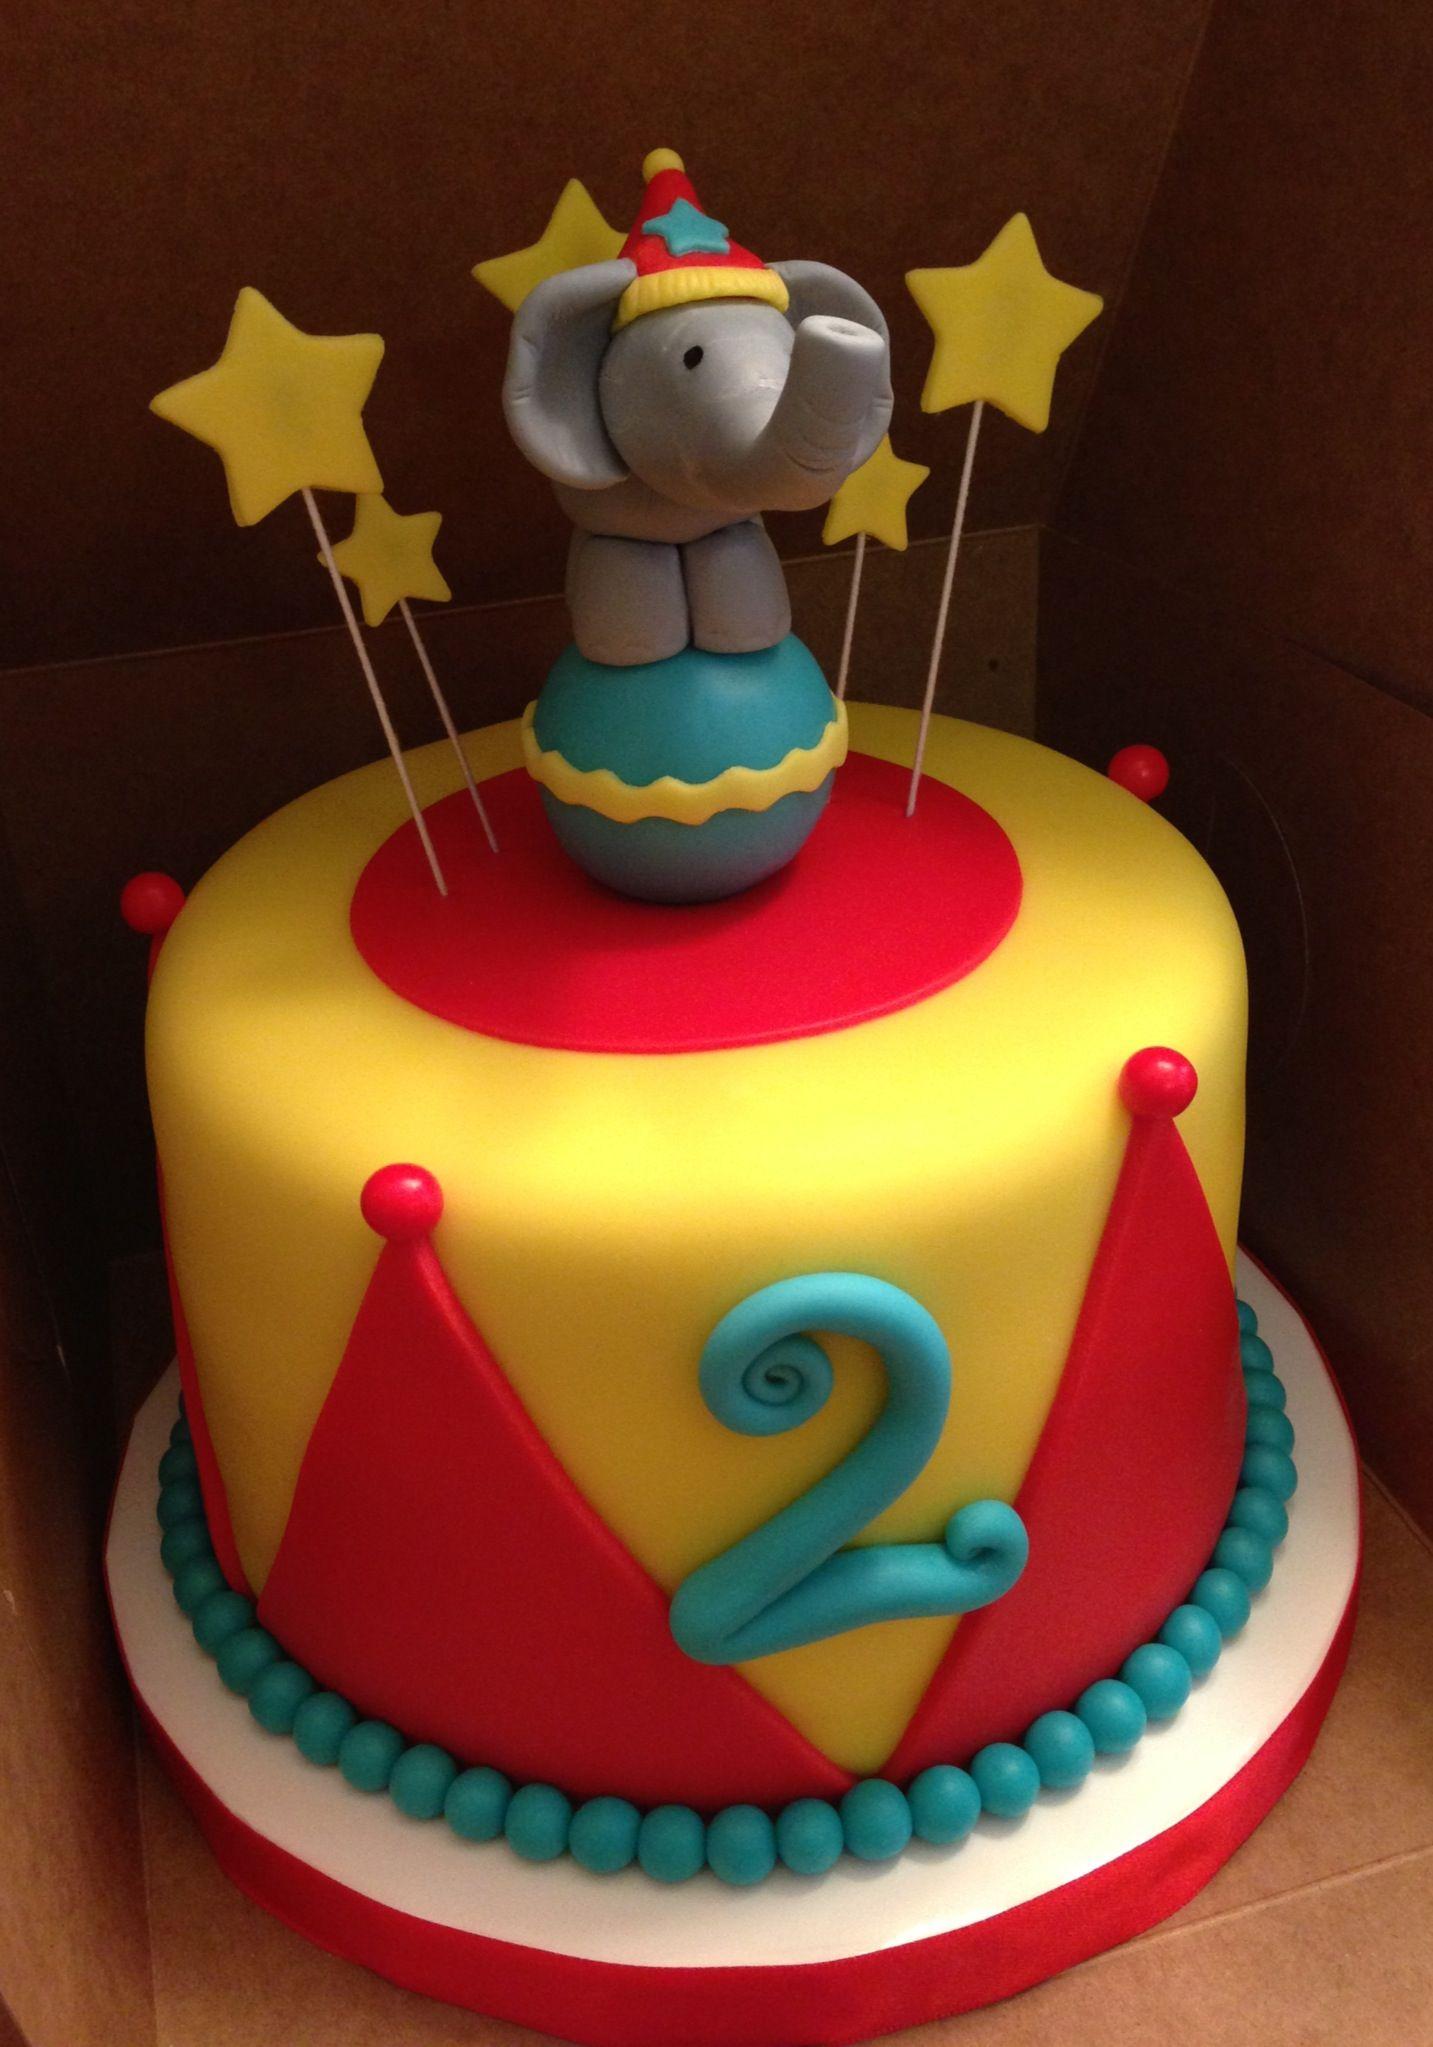 Circus Themed Cake All Fondant Karen Reeves Custom